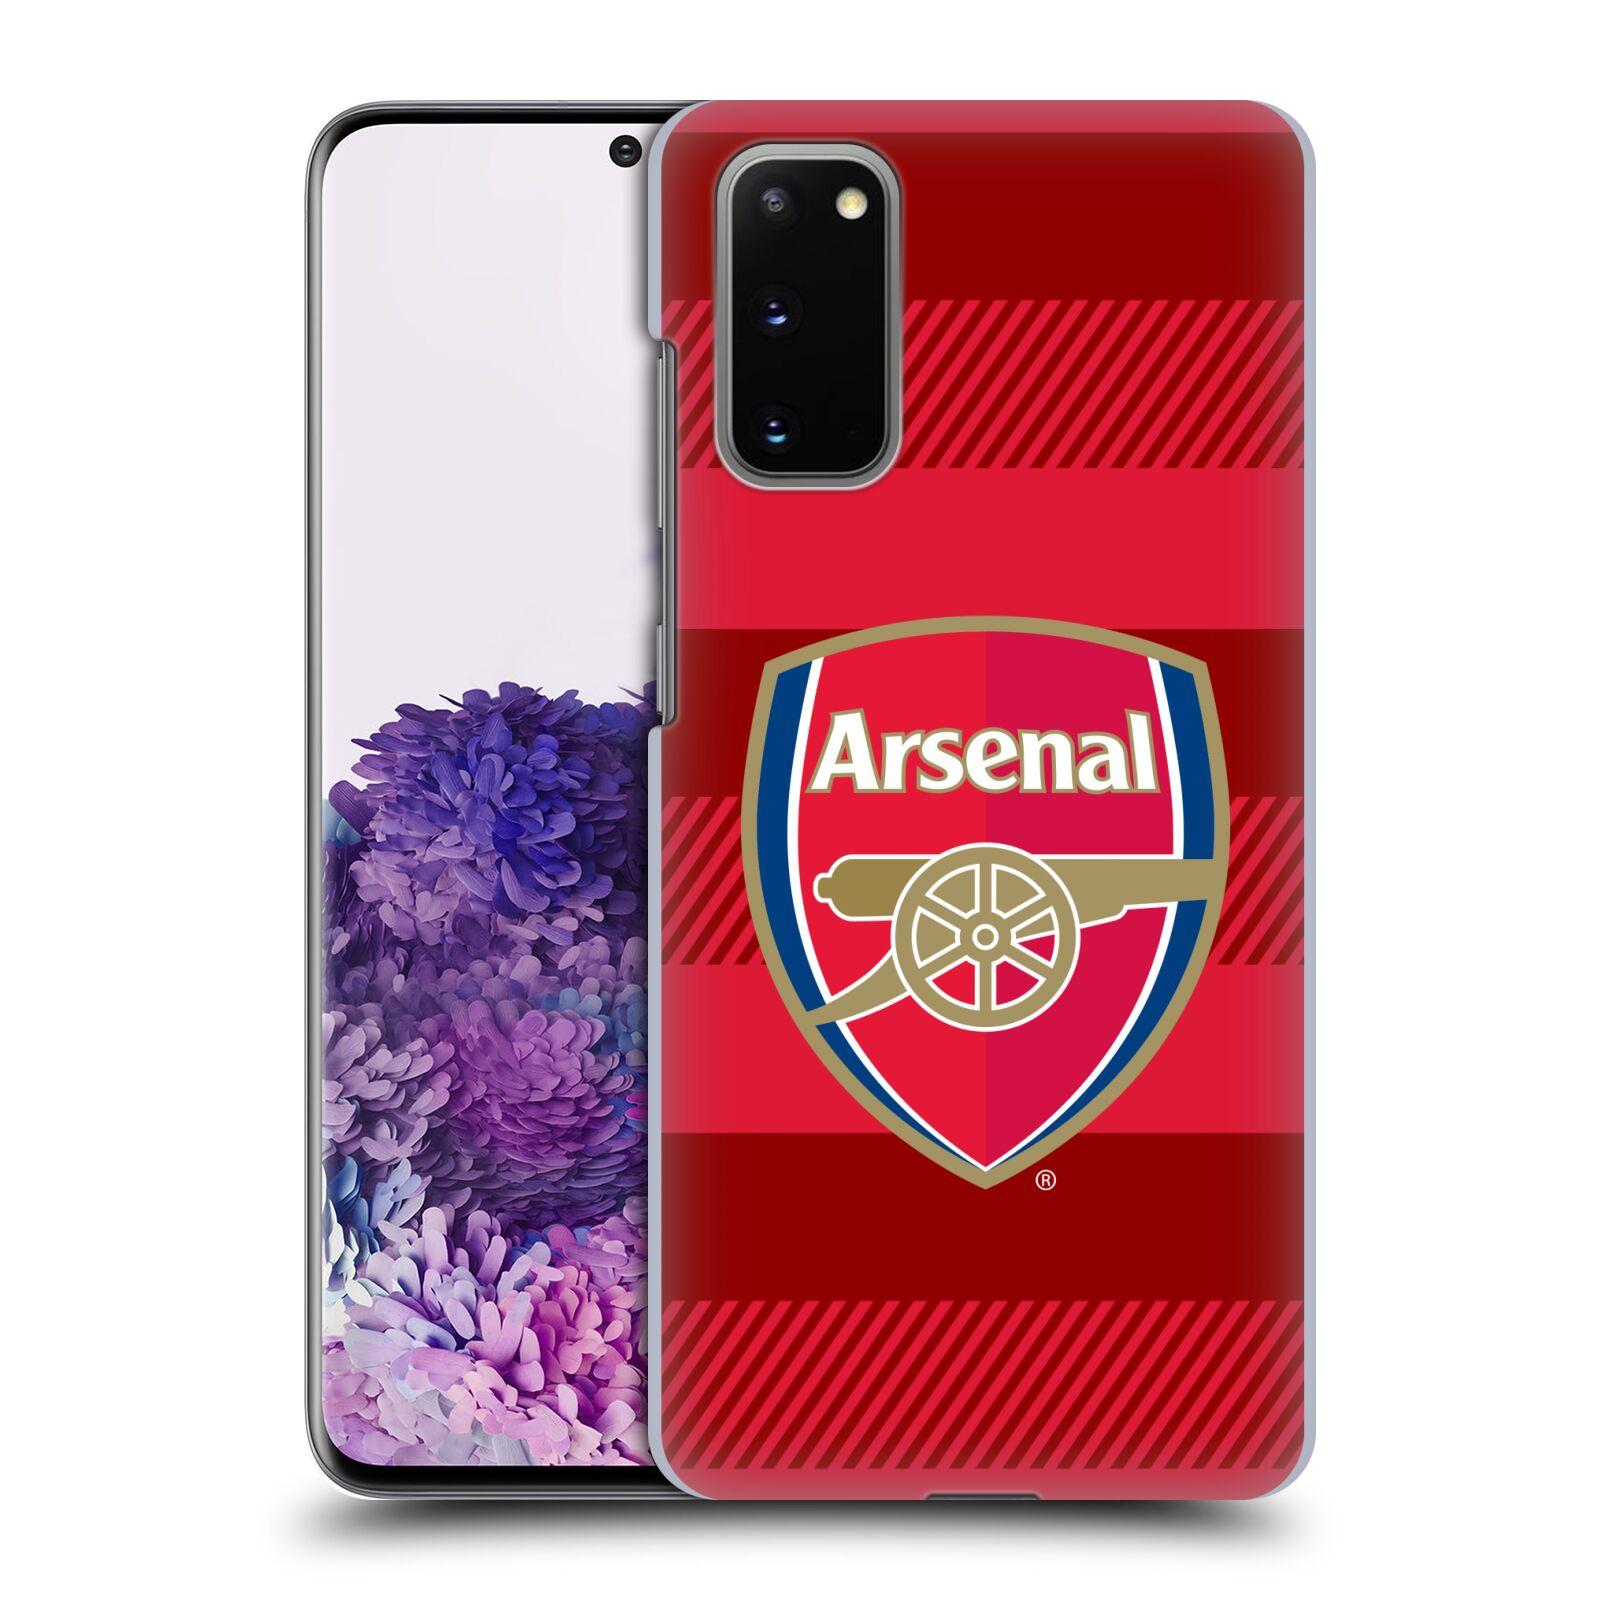 Plastové pouzdro na mobil Samsung Galaxy S20 - Head Case - Arsenal FC - Logo s pruhy